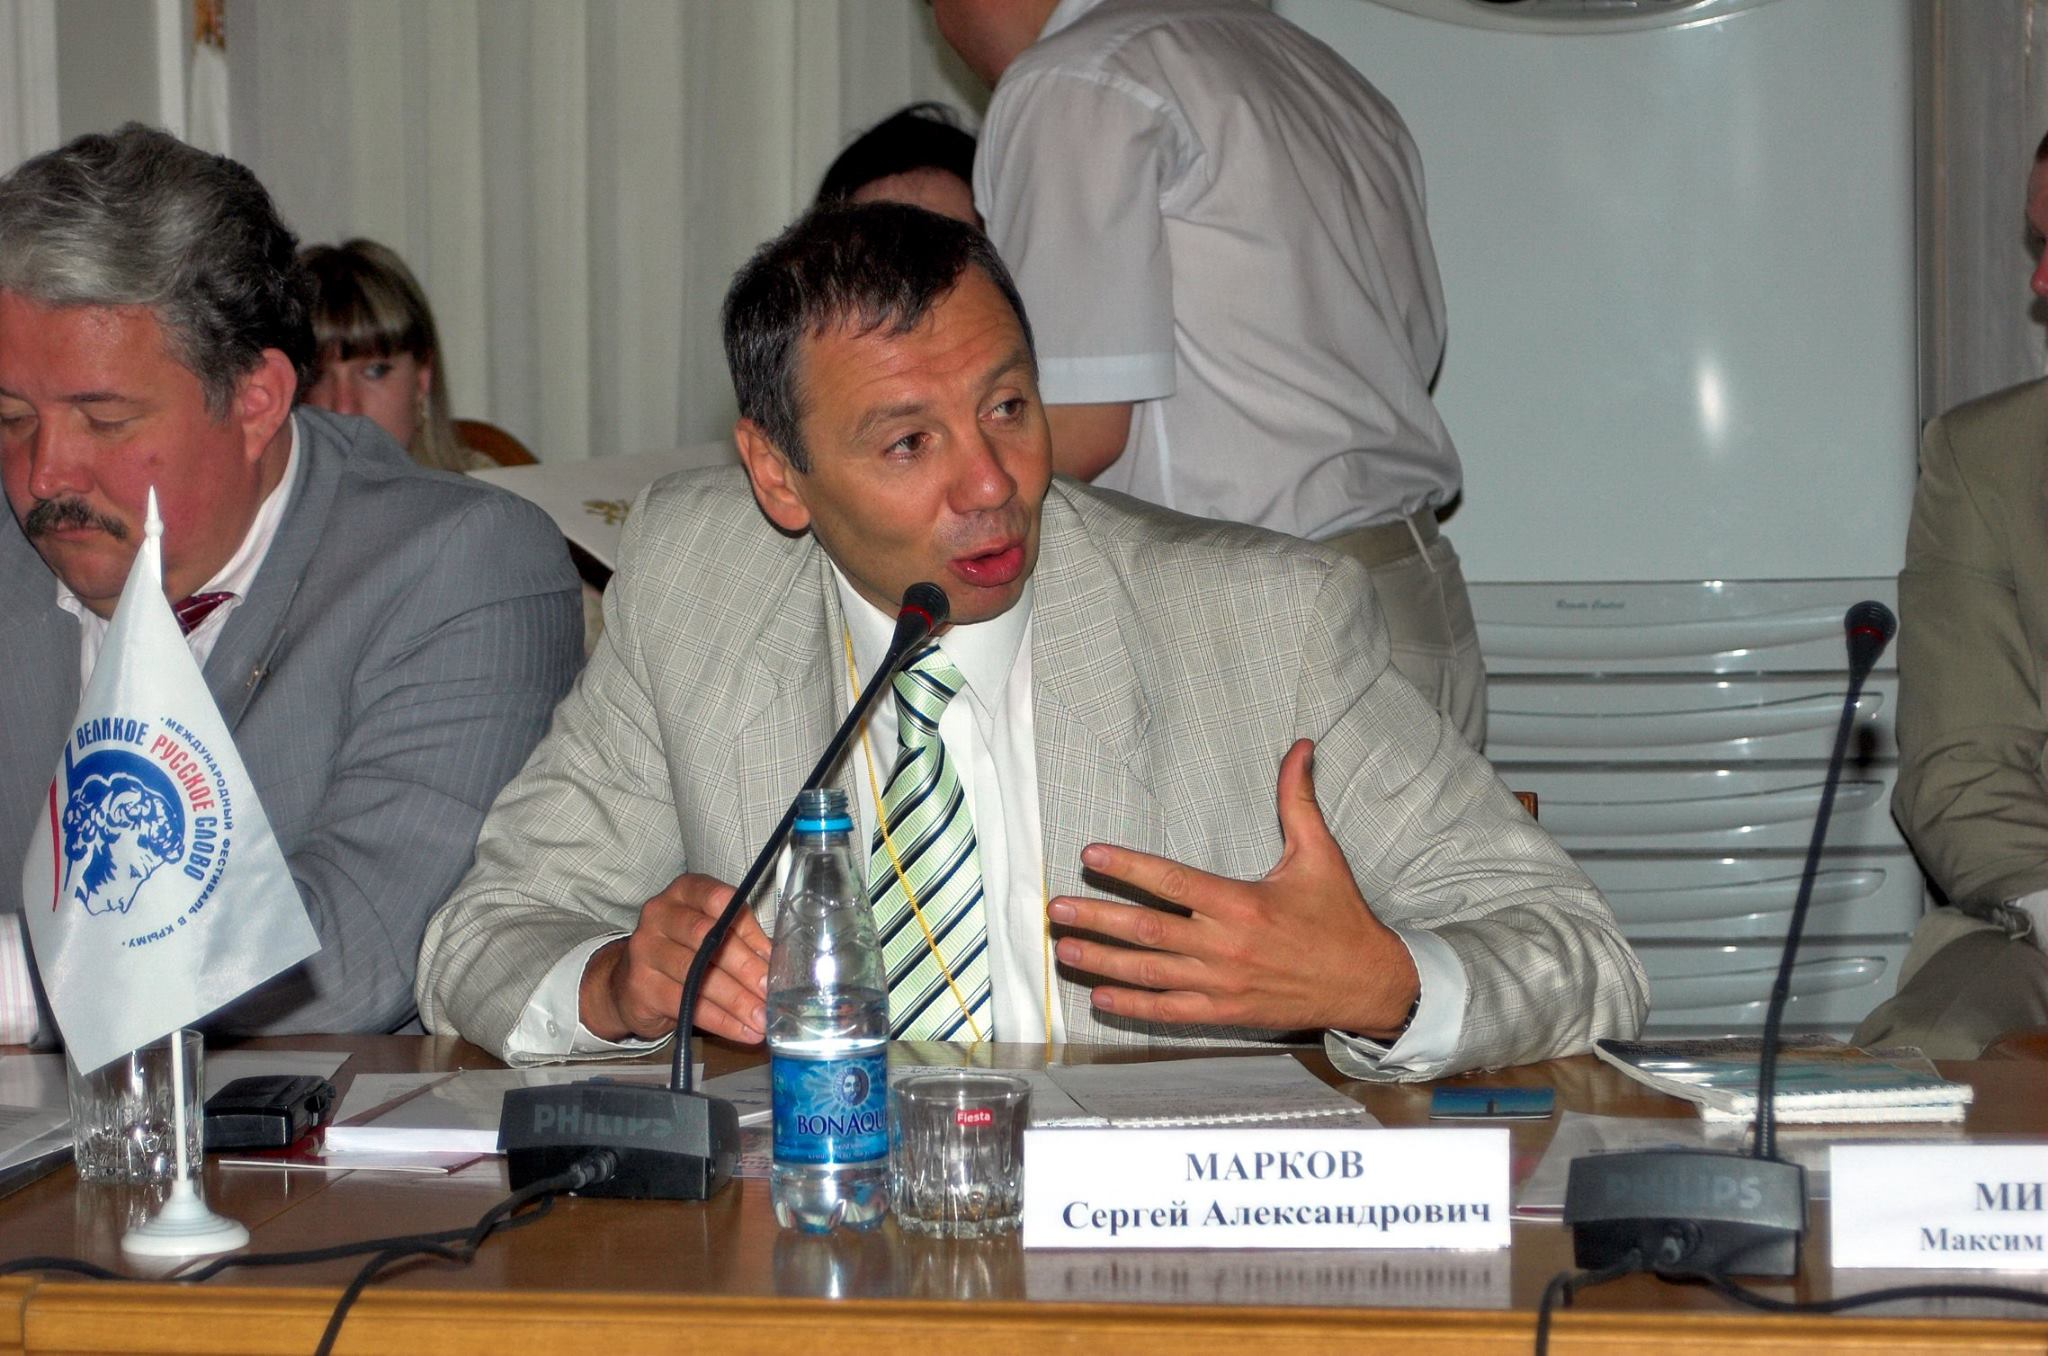 suchkov-maksim-aleksandrovich